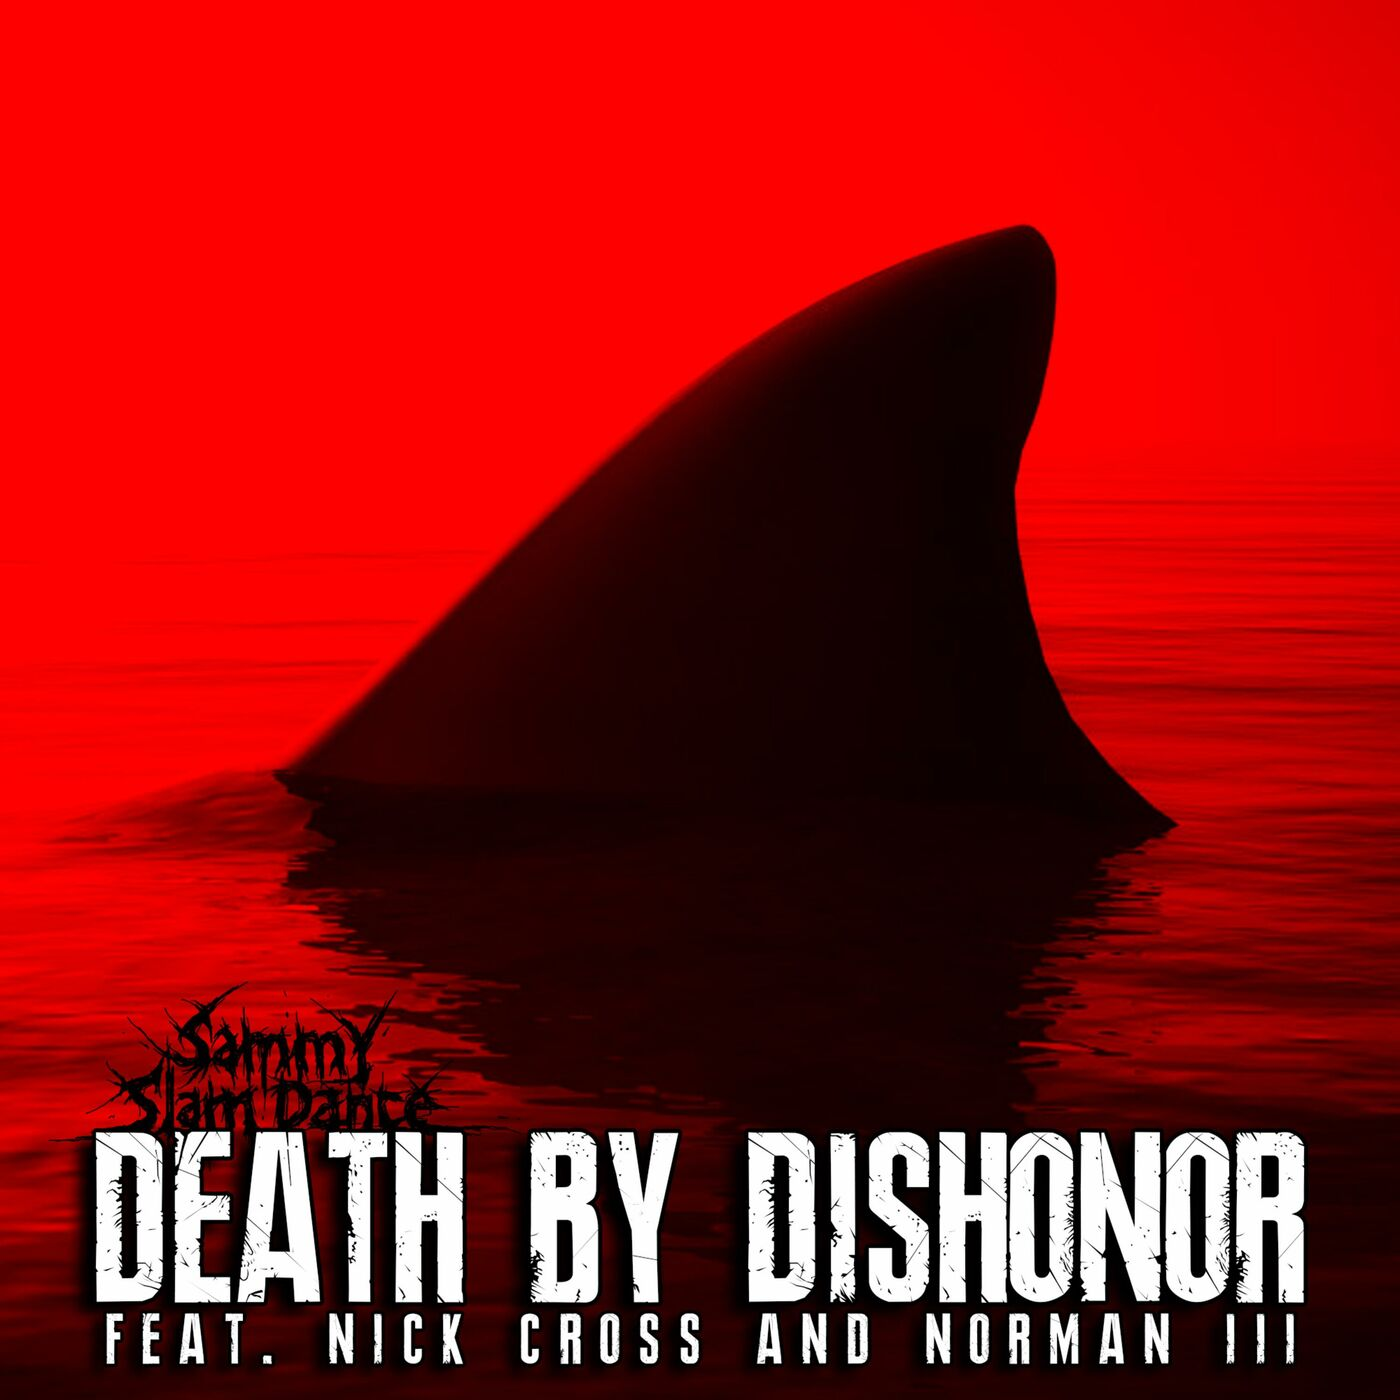 Sammy SlamDance - Death by Dishonor [single] (2019)